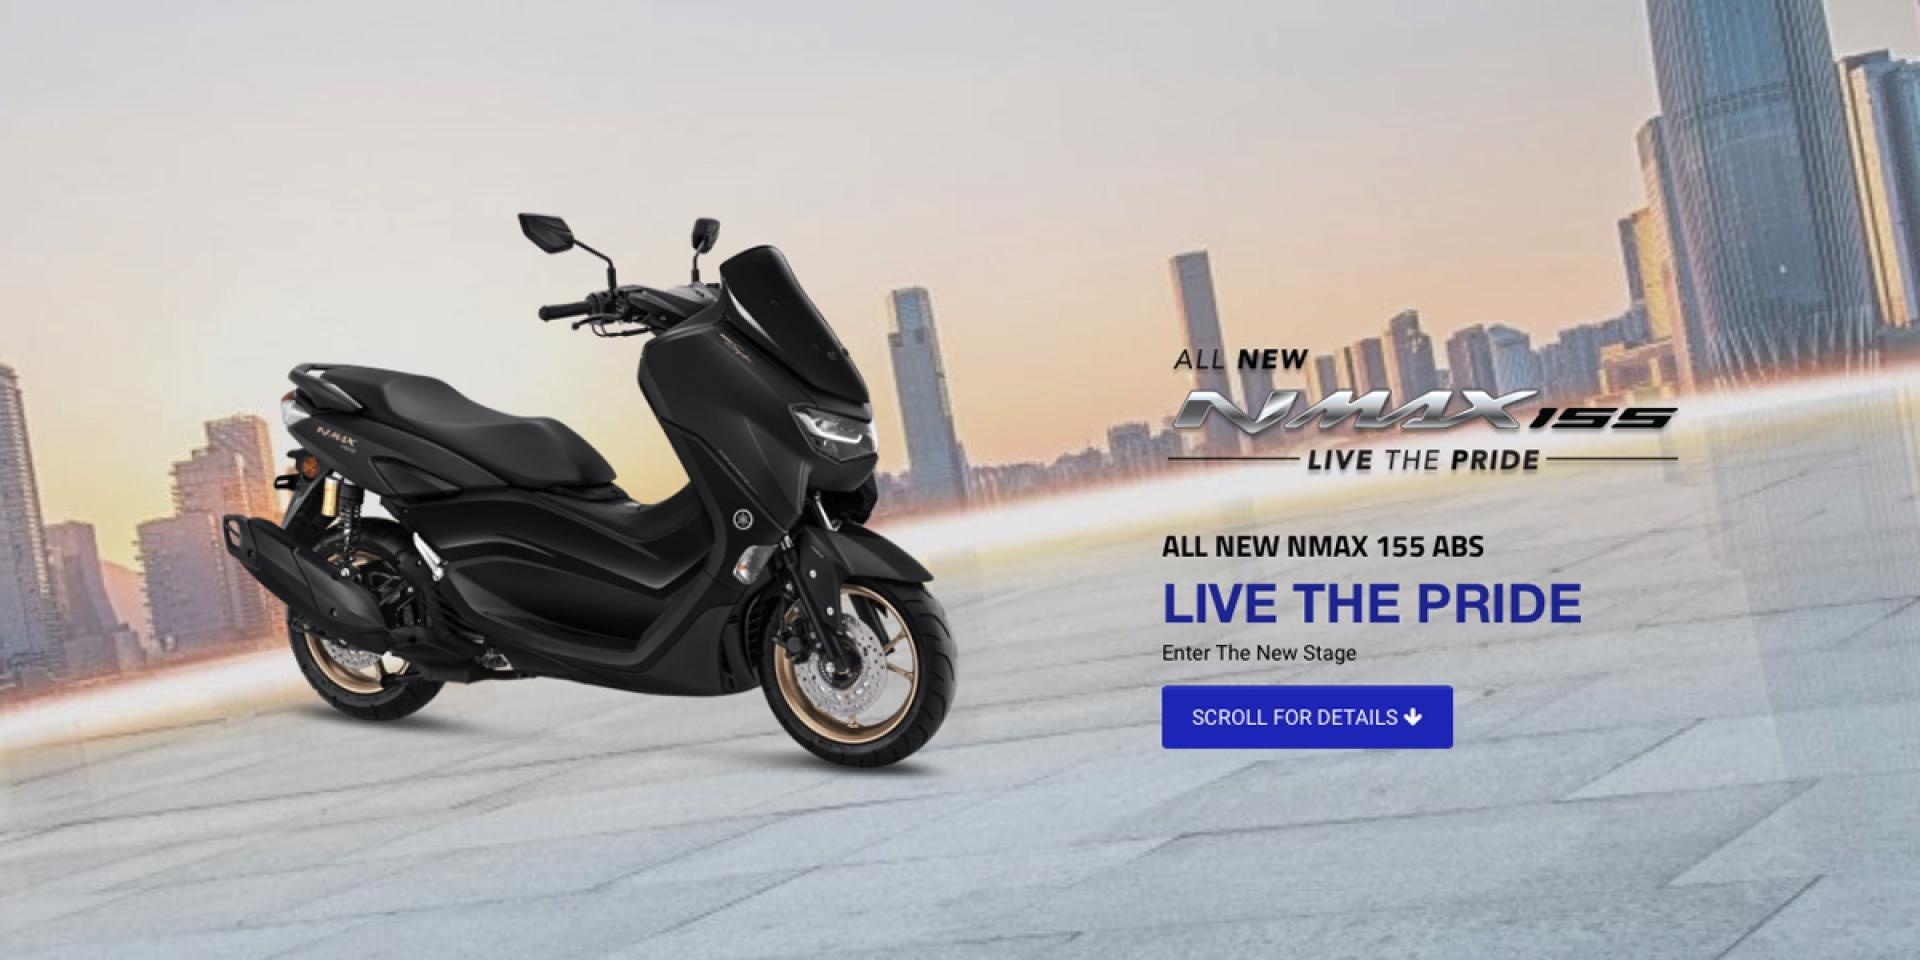 TC系統、手機連線上身,2020 YAMAHA NMAX 155印尼登場,同場發表WR 155 R!